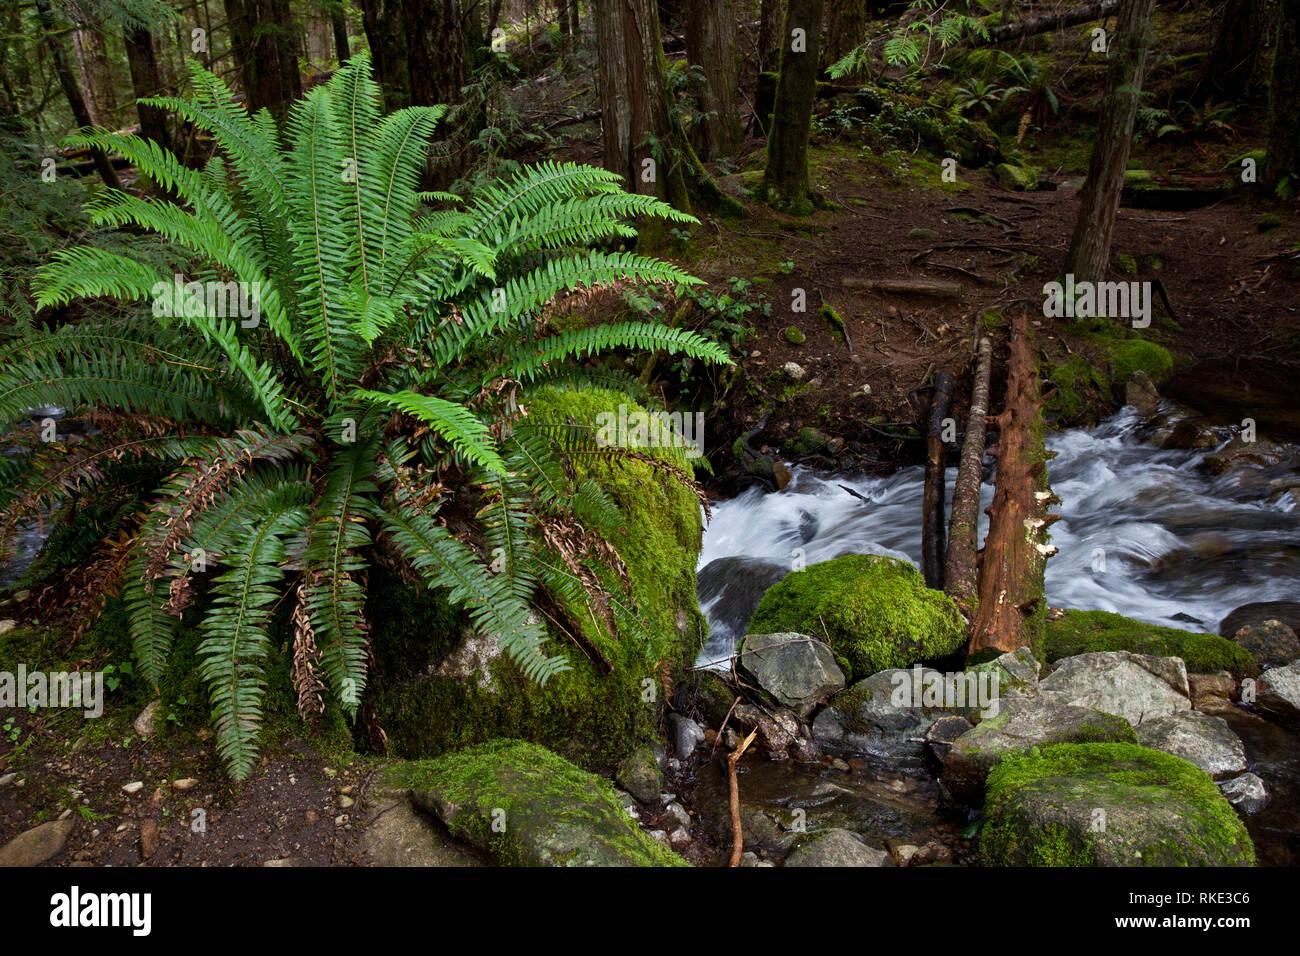 Tenedos Bay, Desolation Sound, British Columbia, Canada - Stock Image